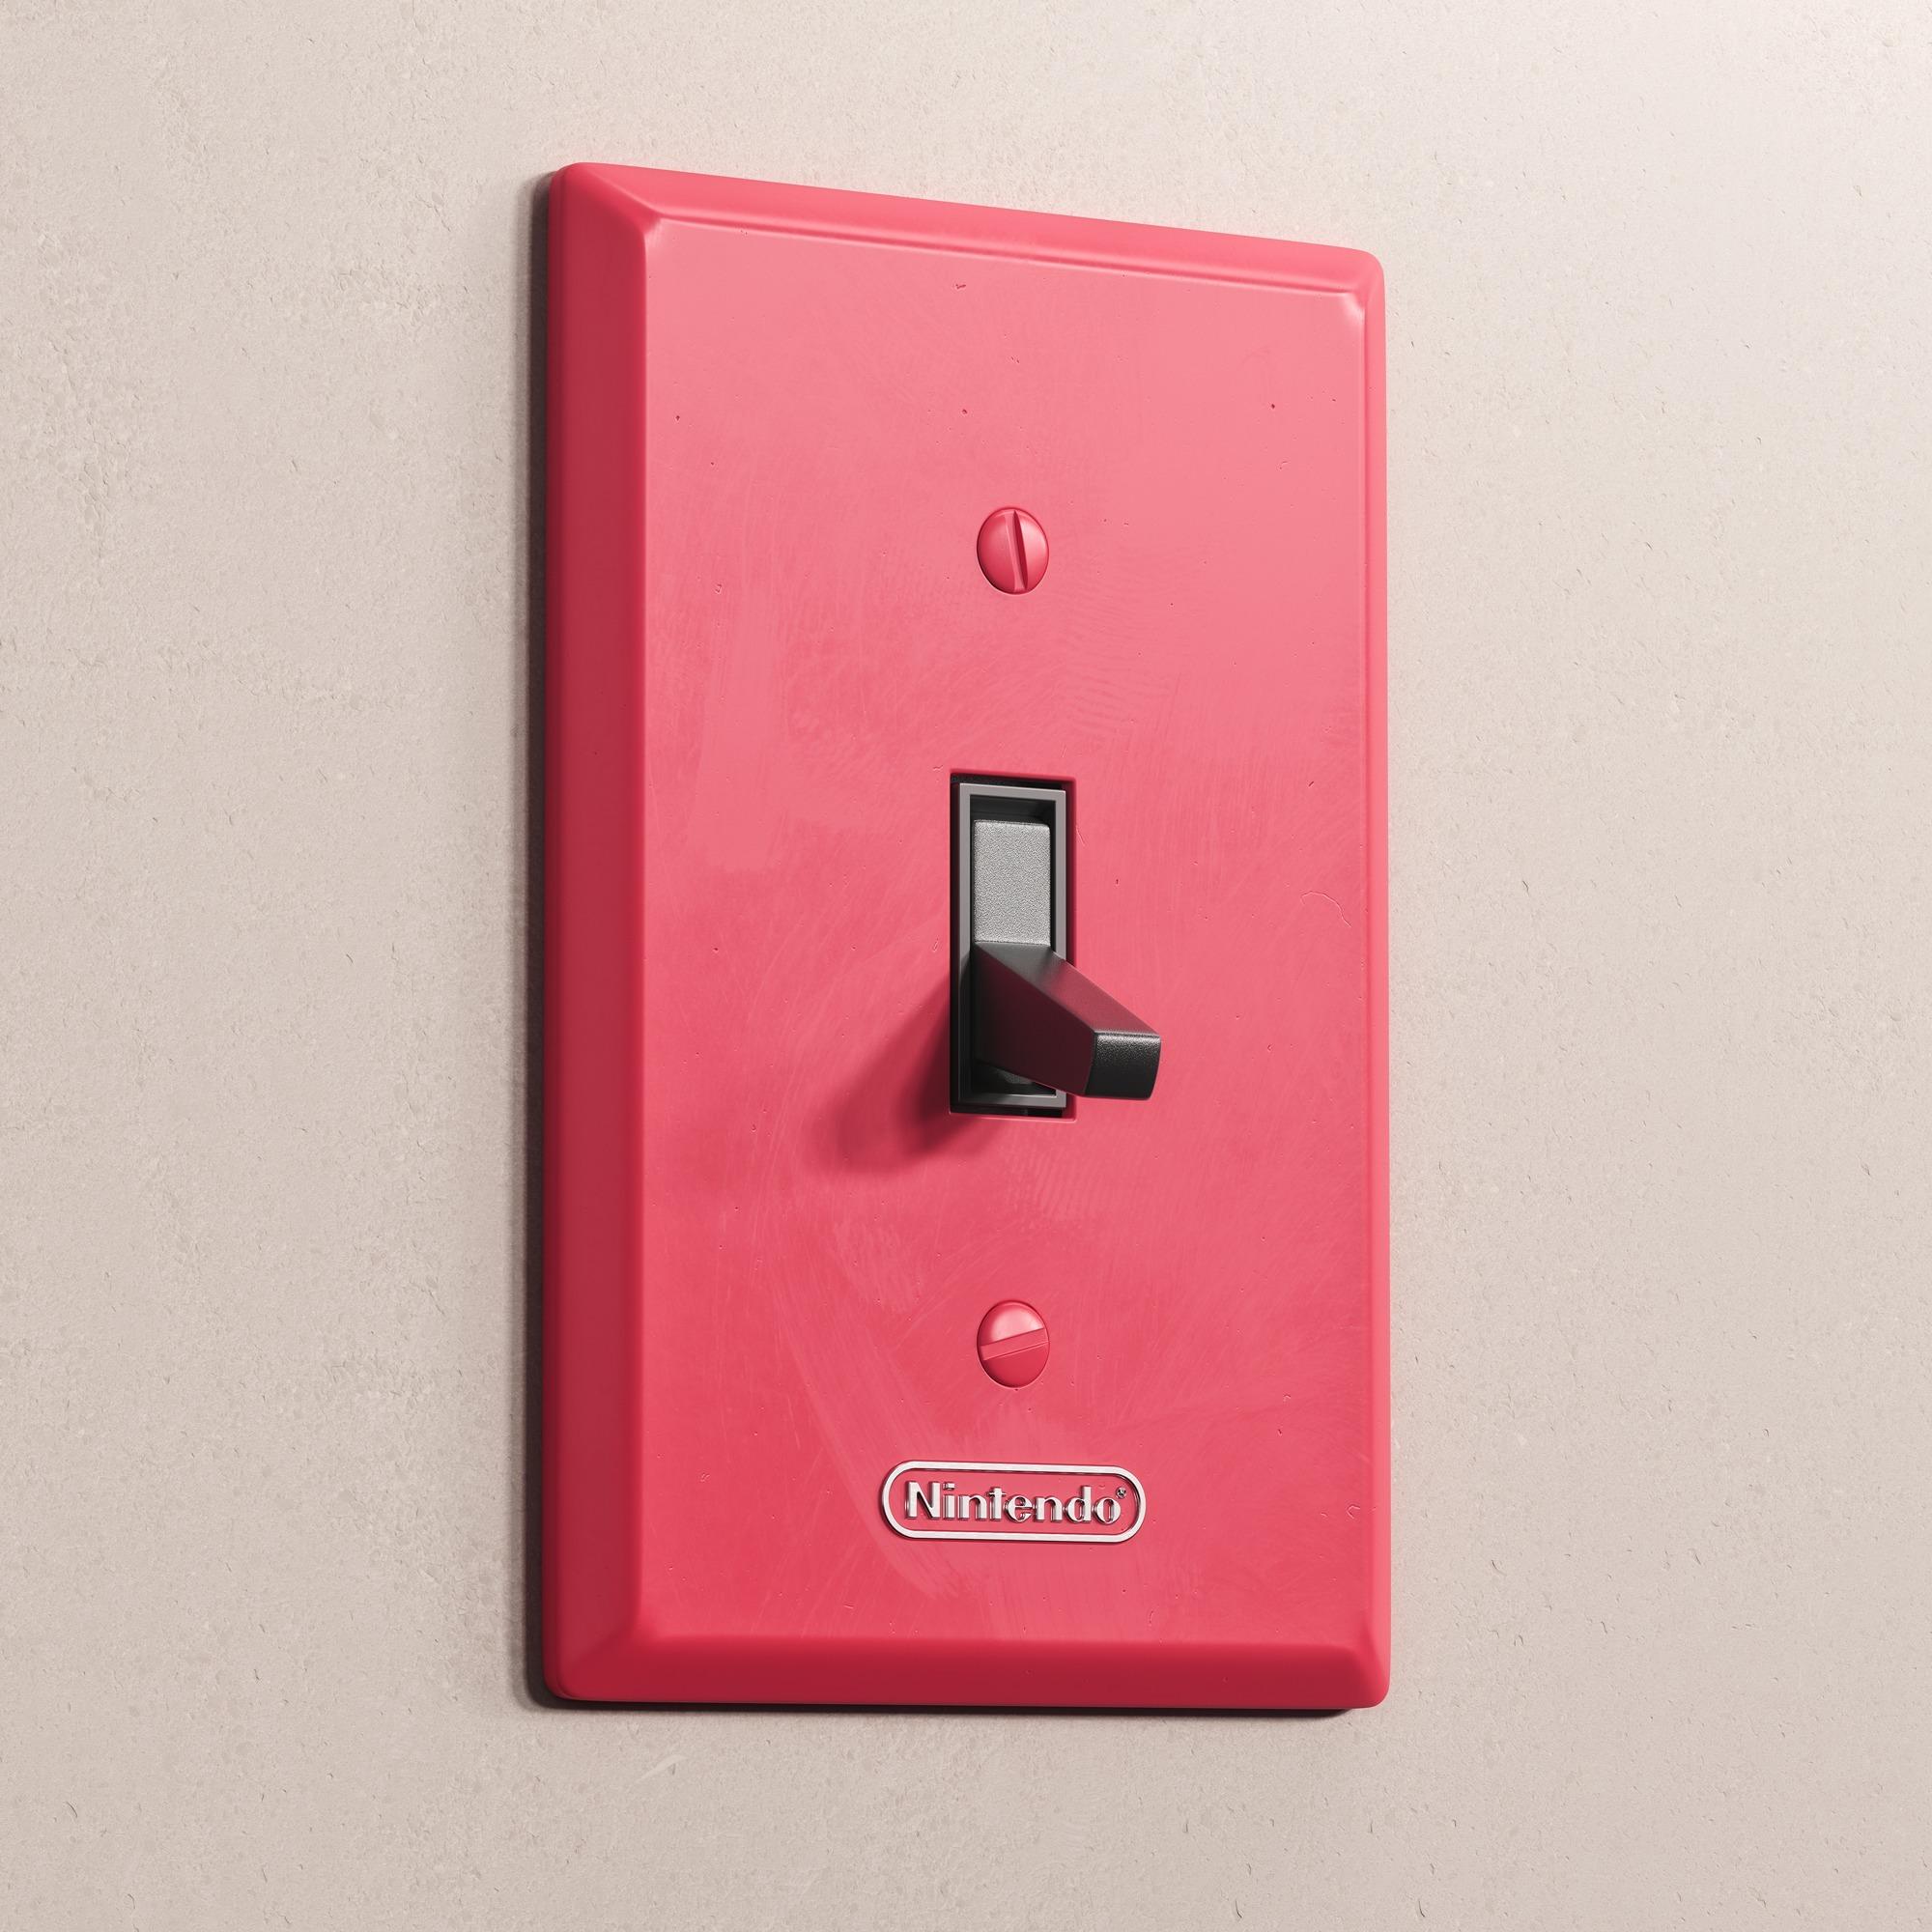 nintendo switch - philiplueck | ello